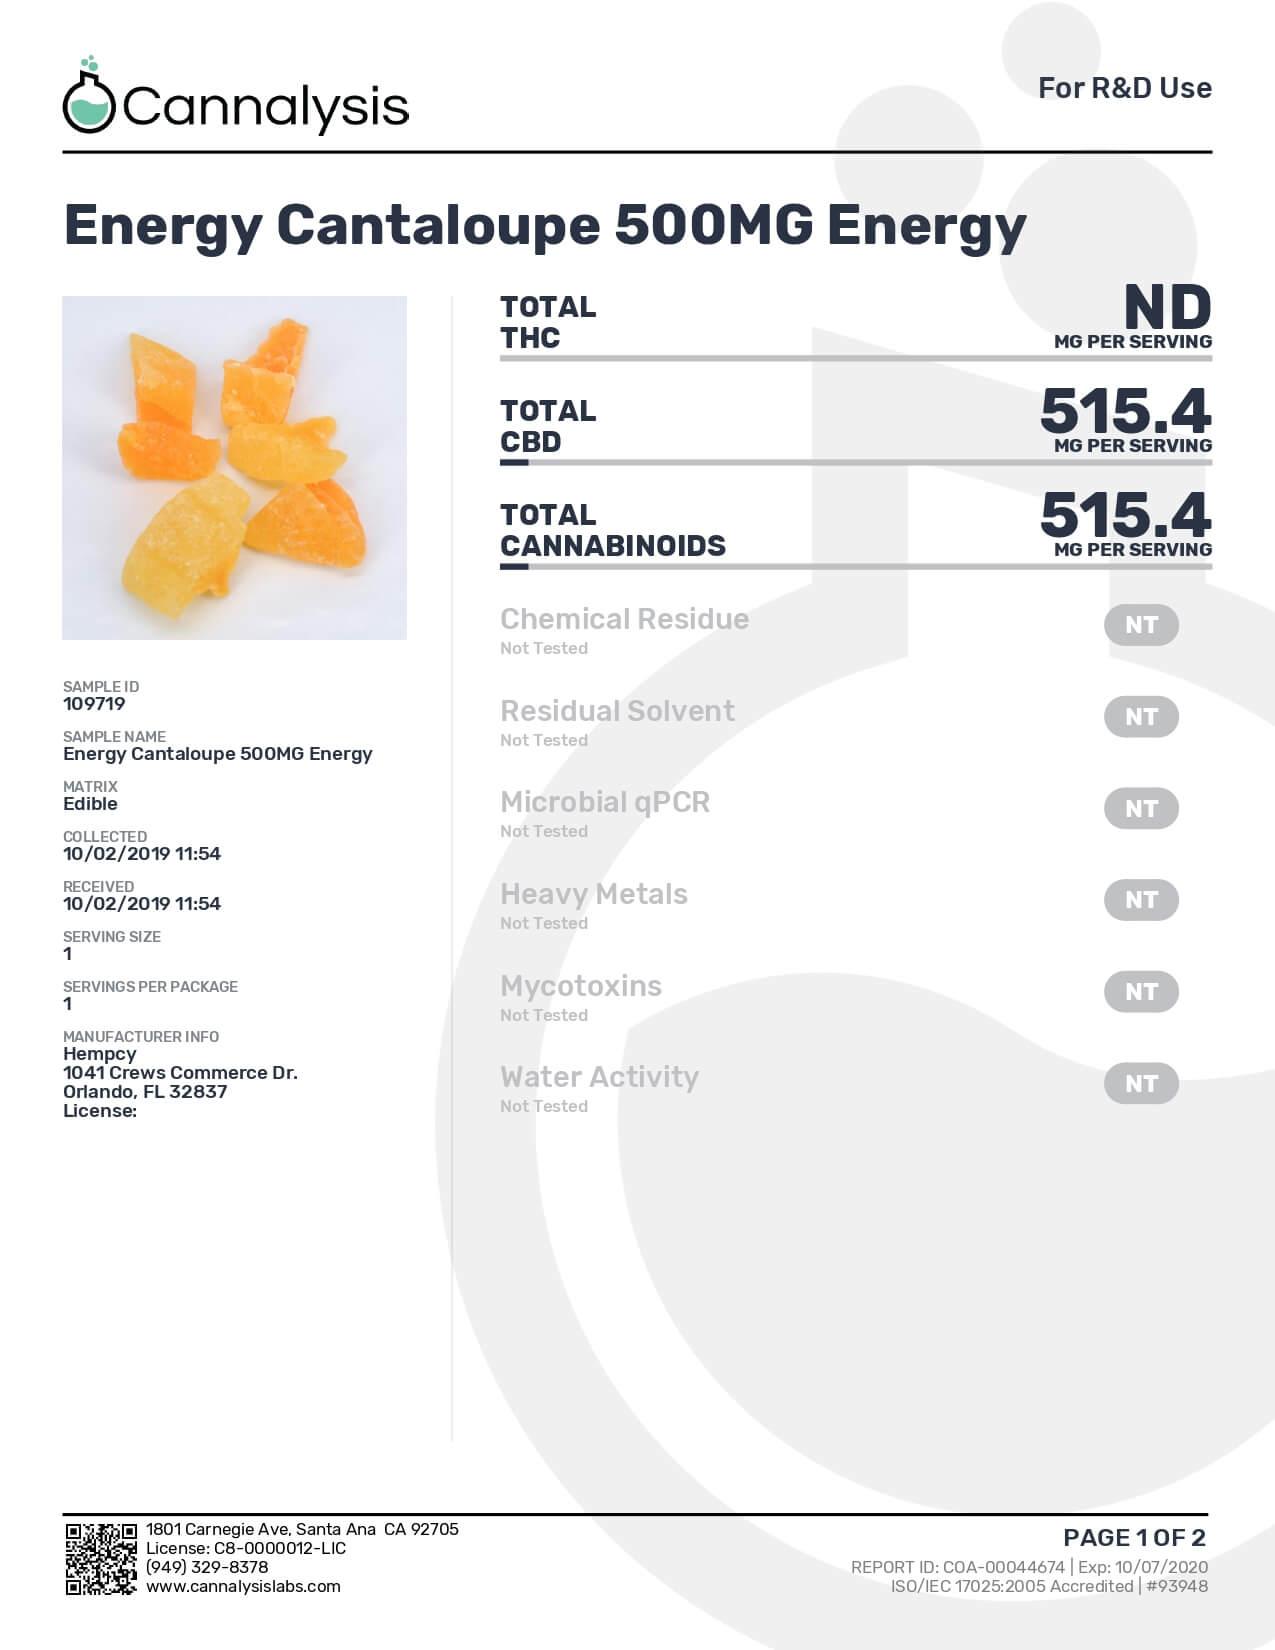 Hempcy CBD Edible Energy Cantaloupe Lab Report